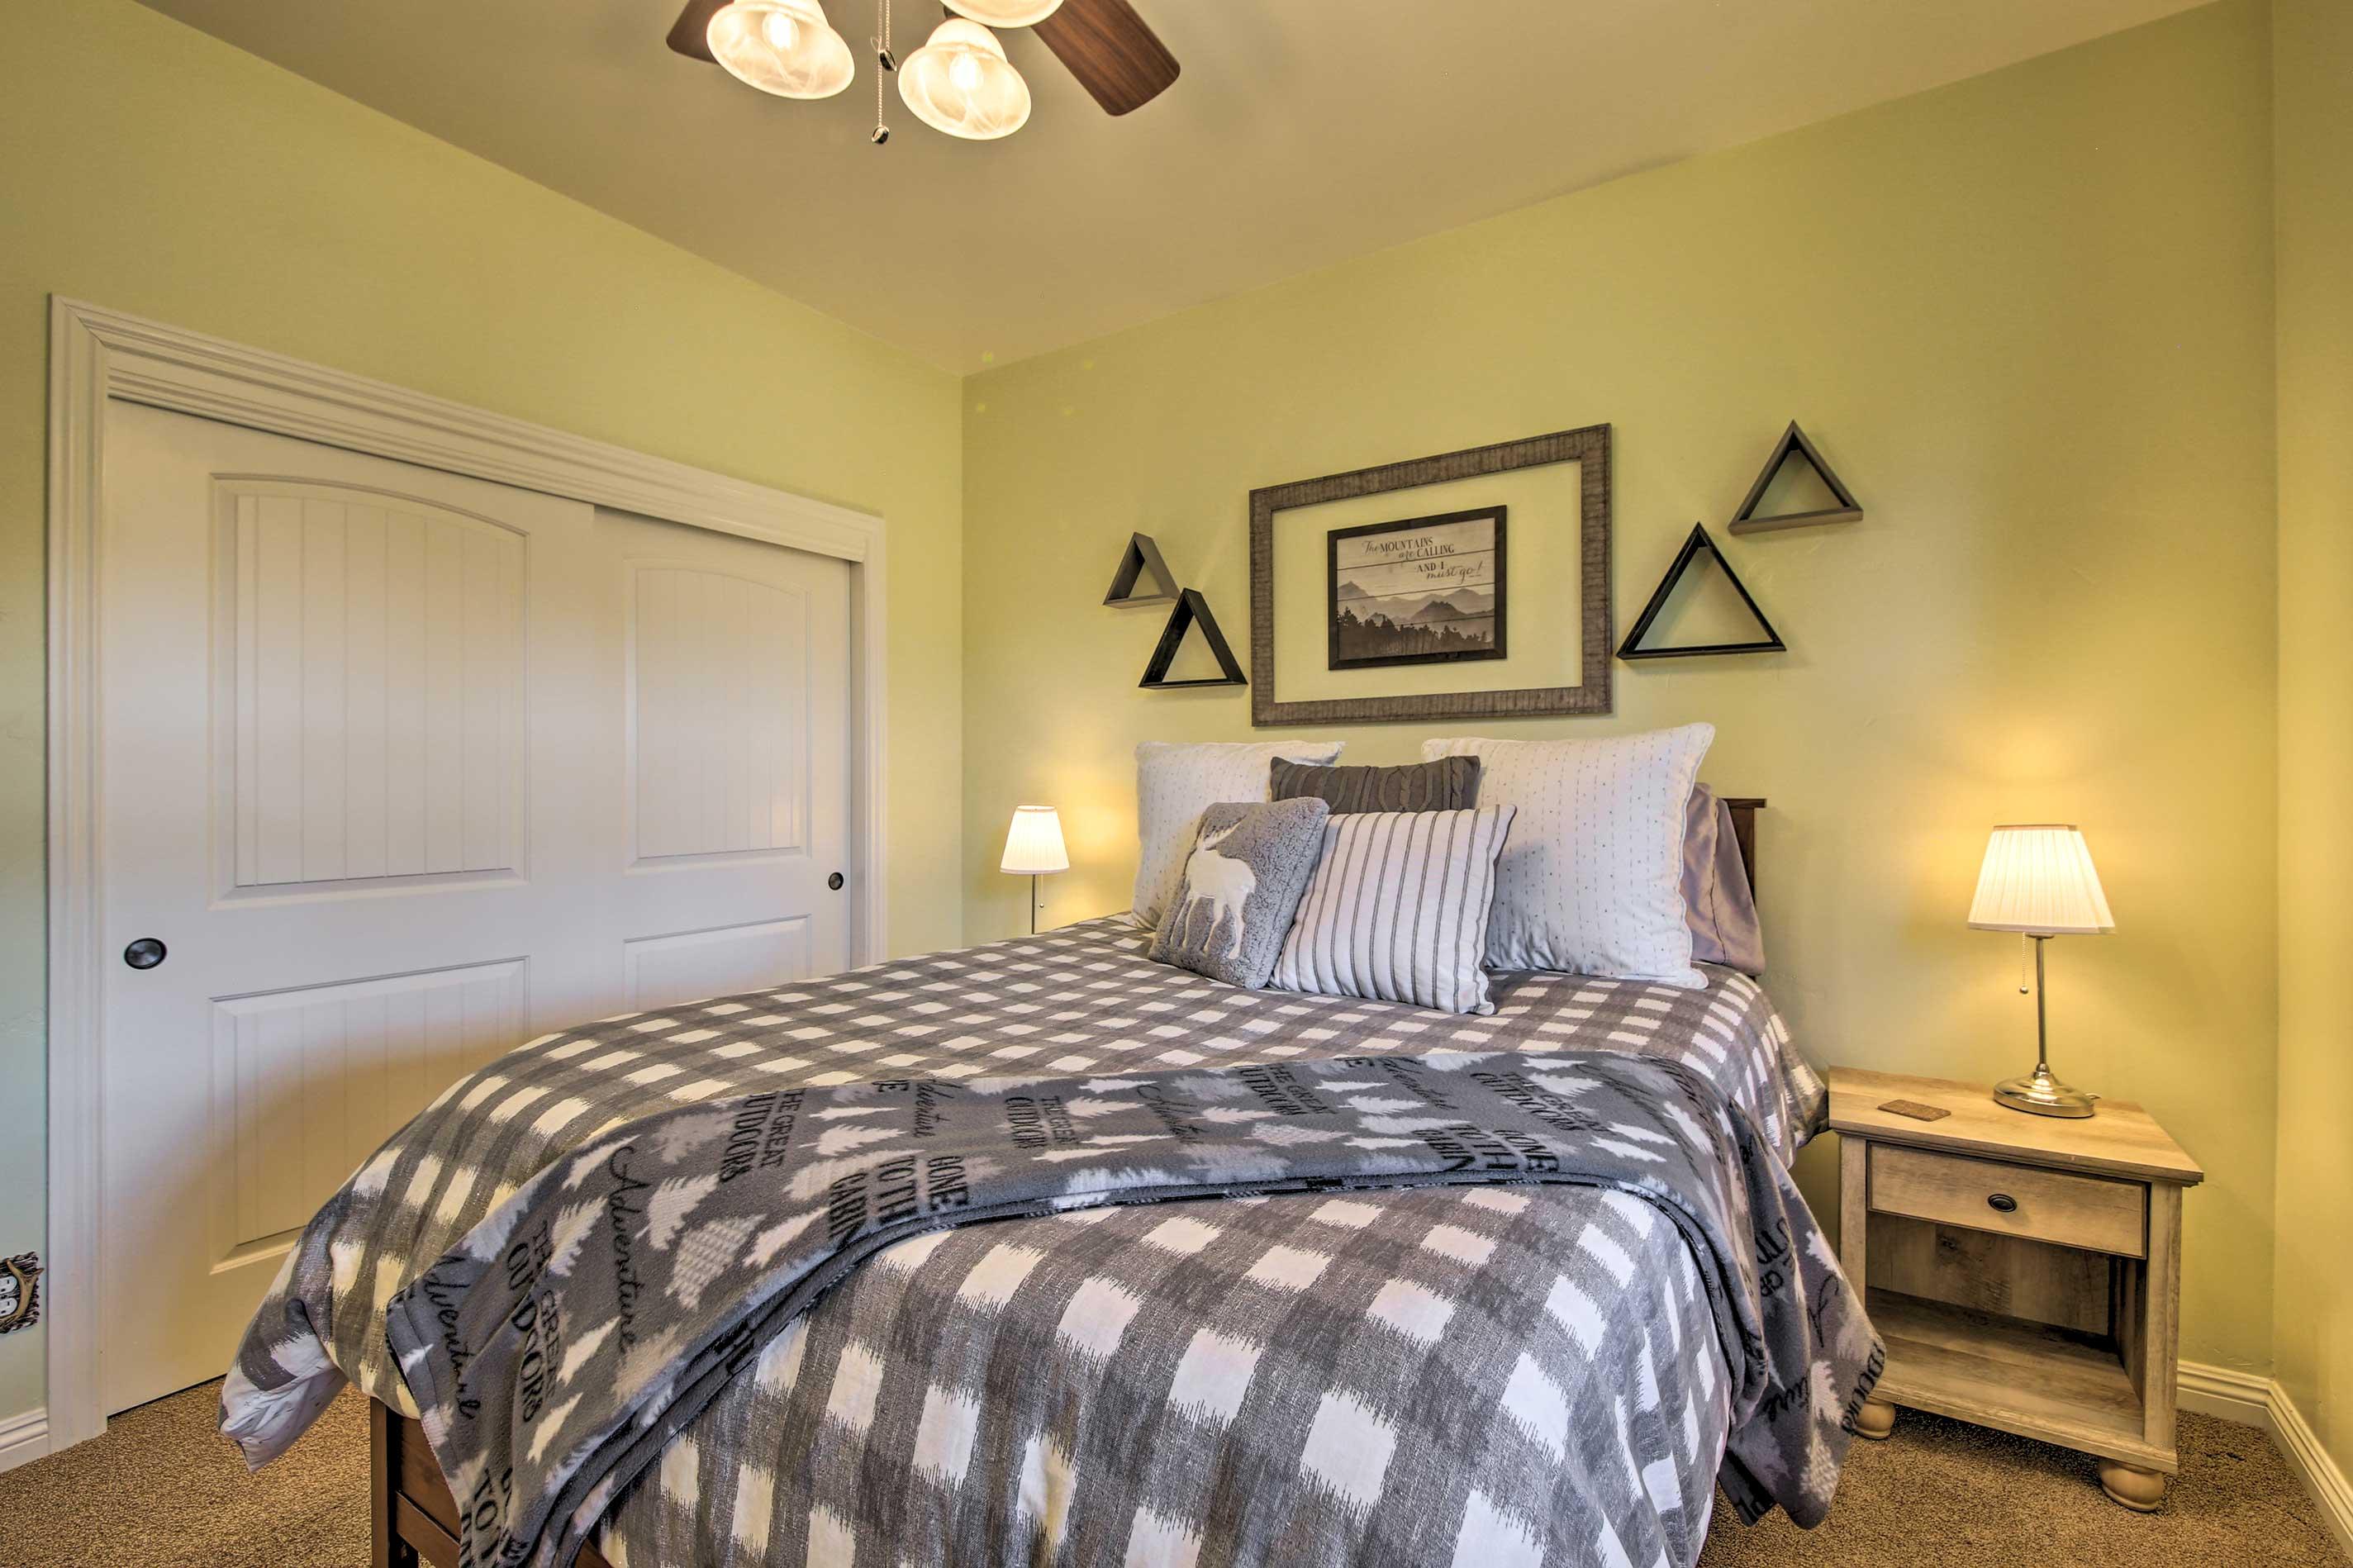 Feeling sleepy? Retire to this room's cozy queen bed.